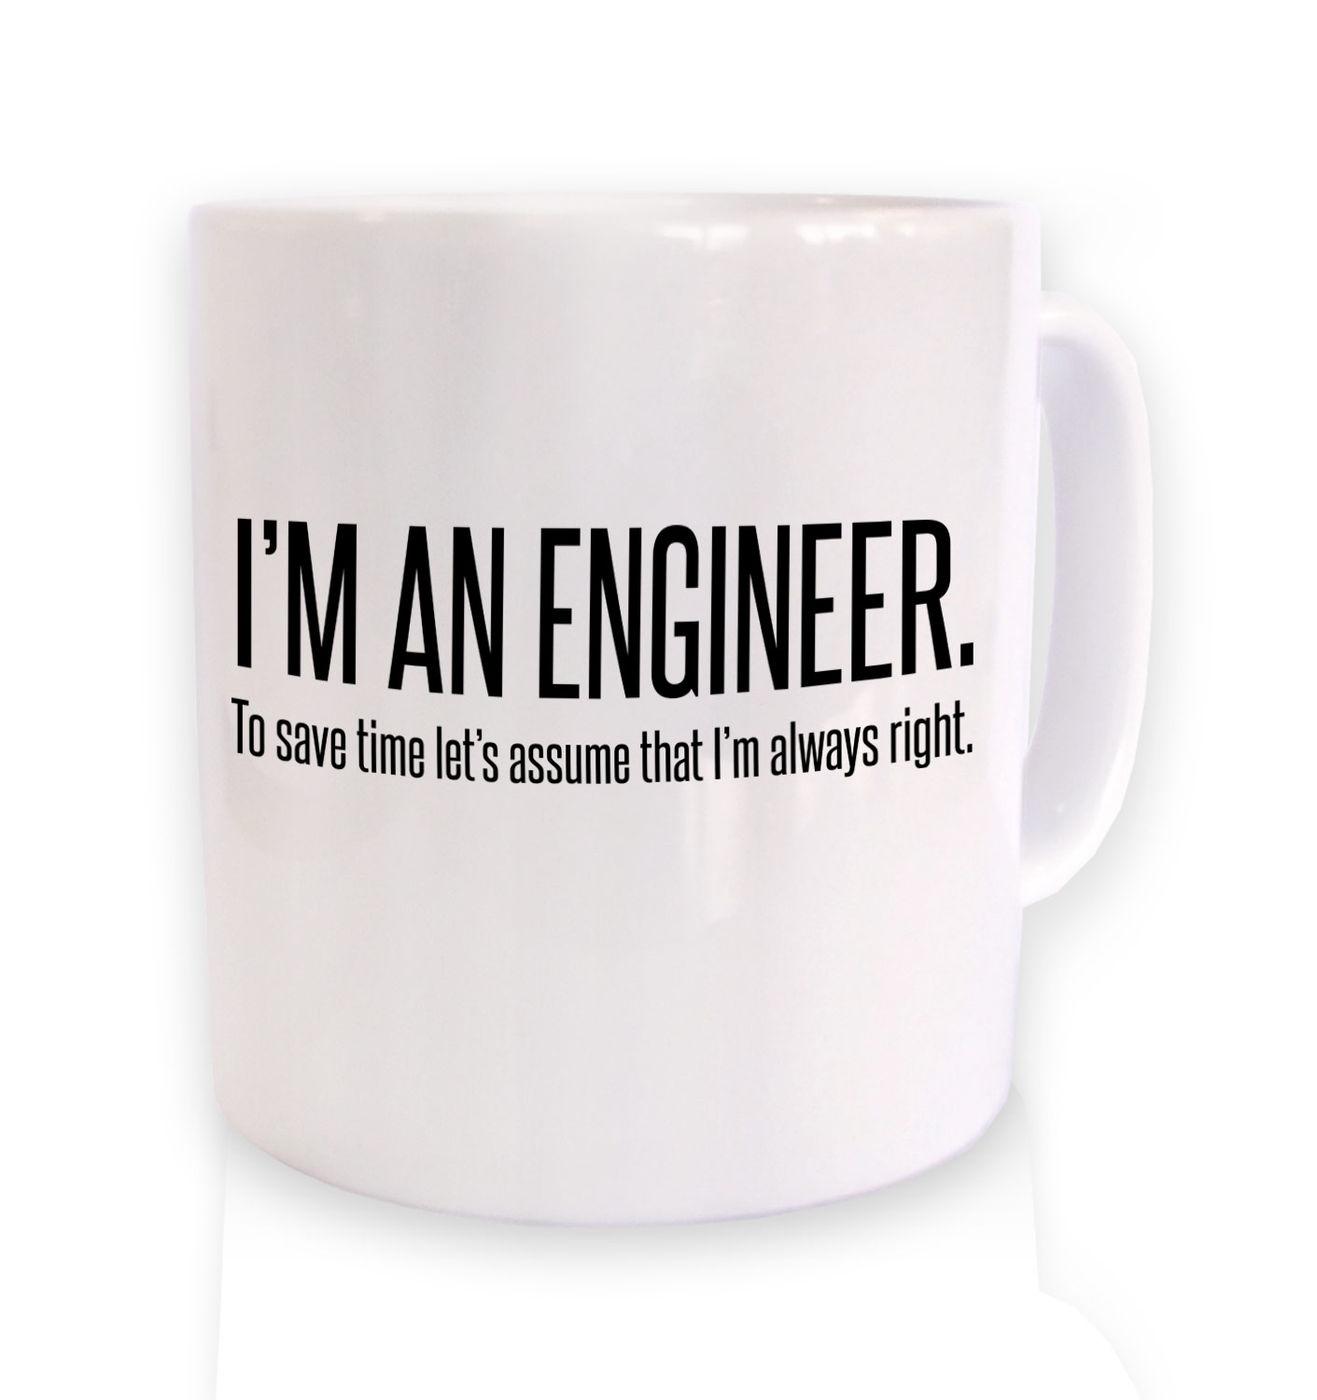 Engineer Always Right mug by Something Geeky